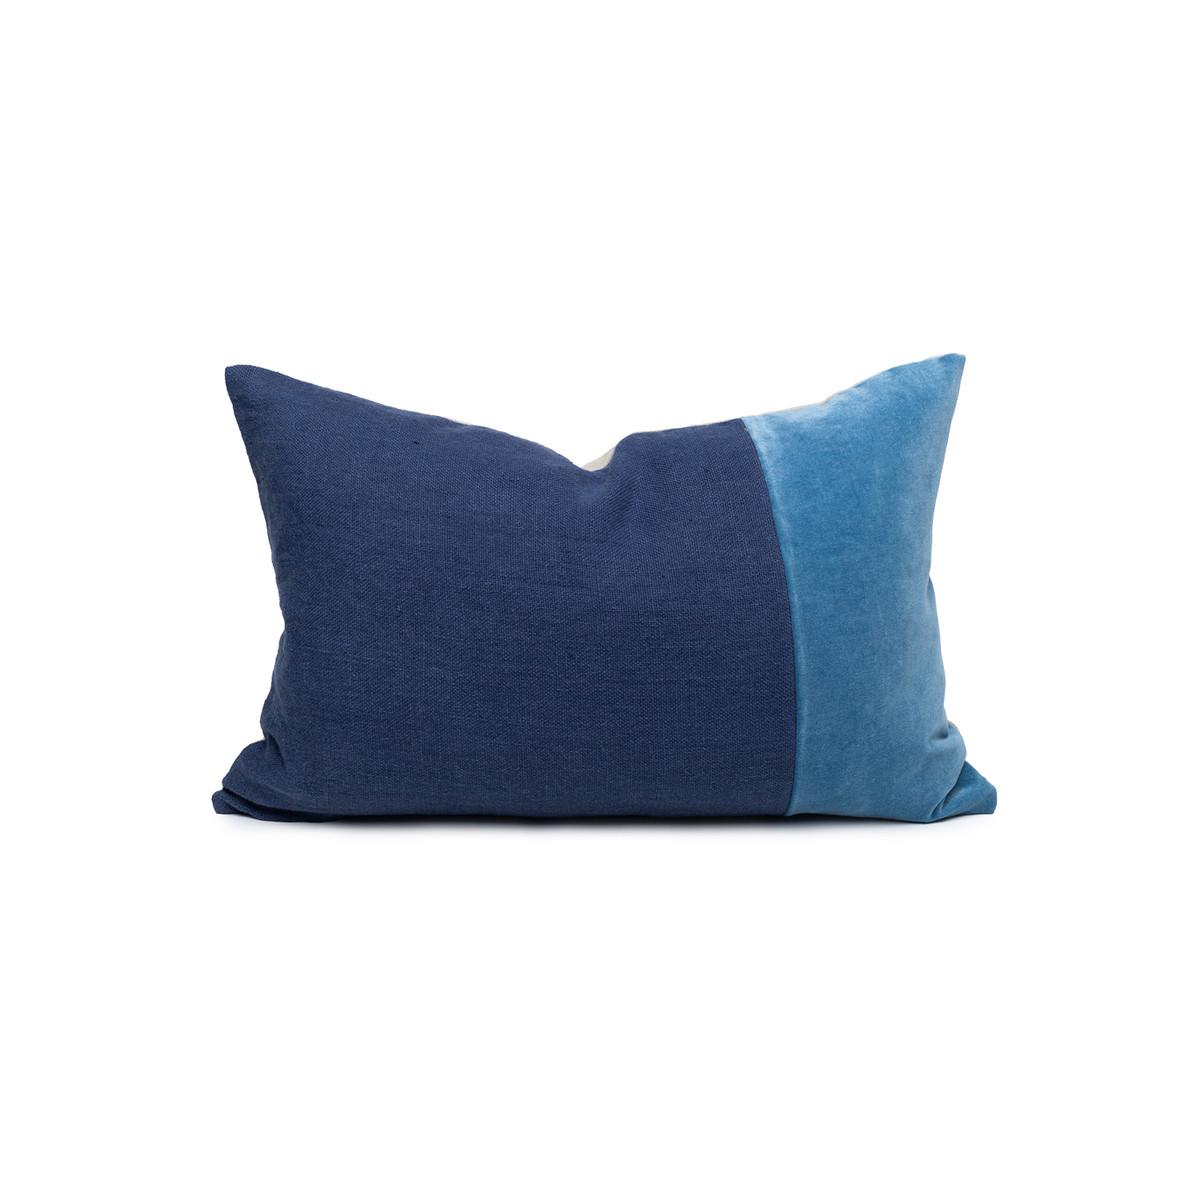 Doux Kyanite Velvet Lumbar Pillow - Front